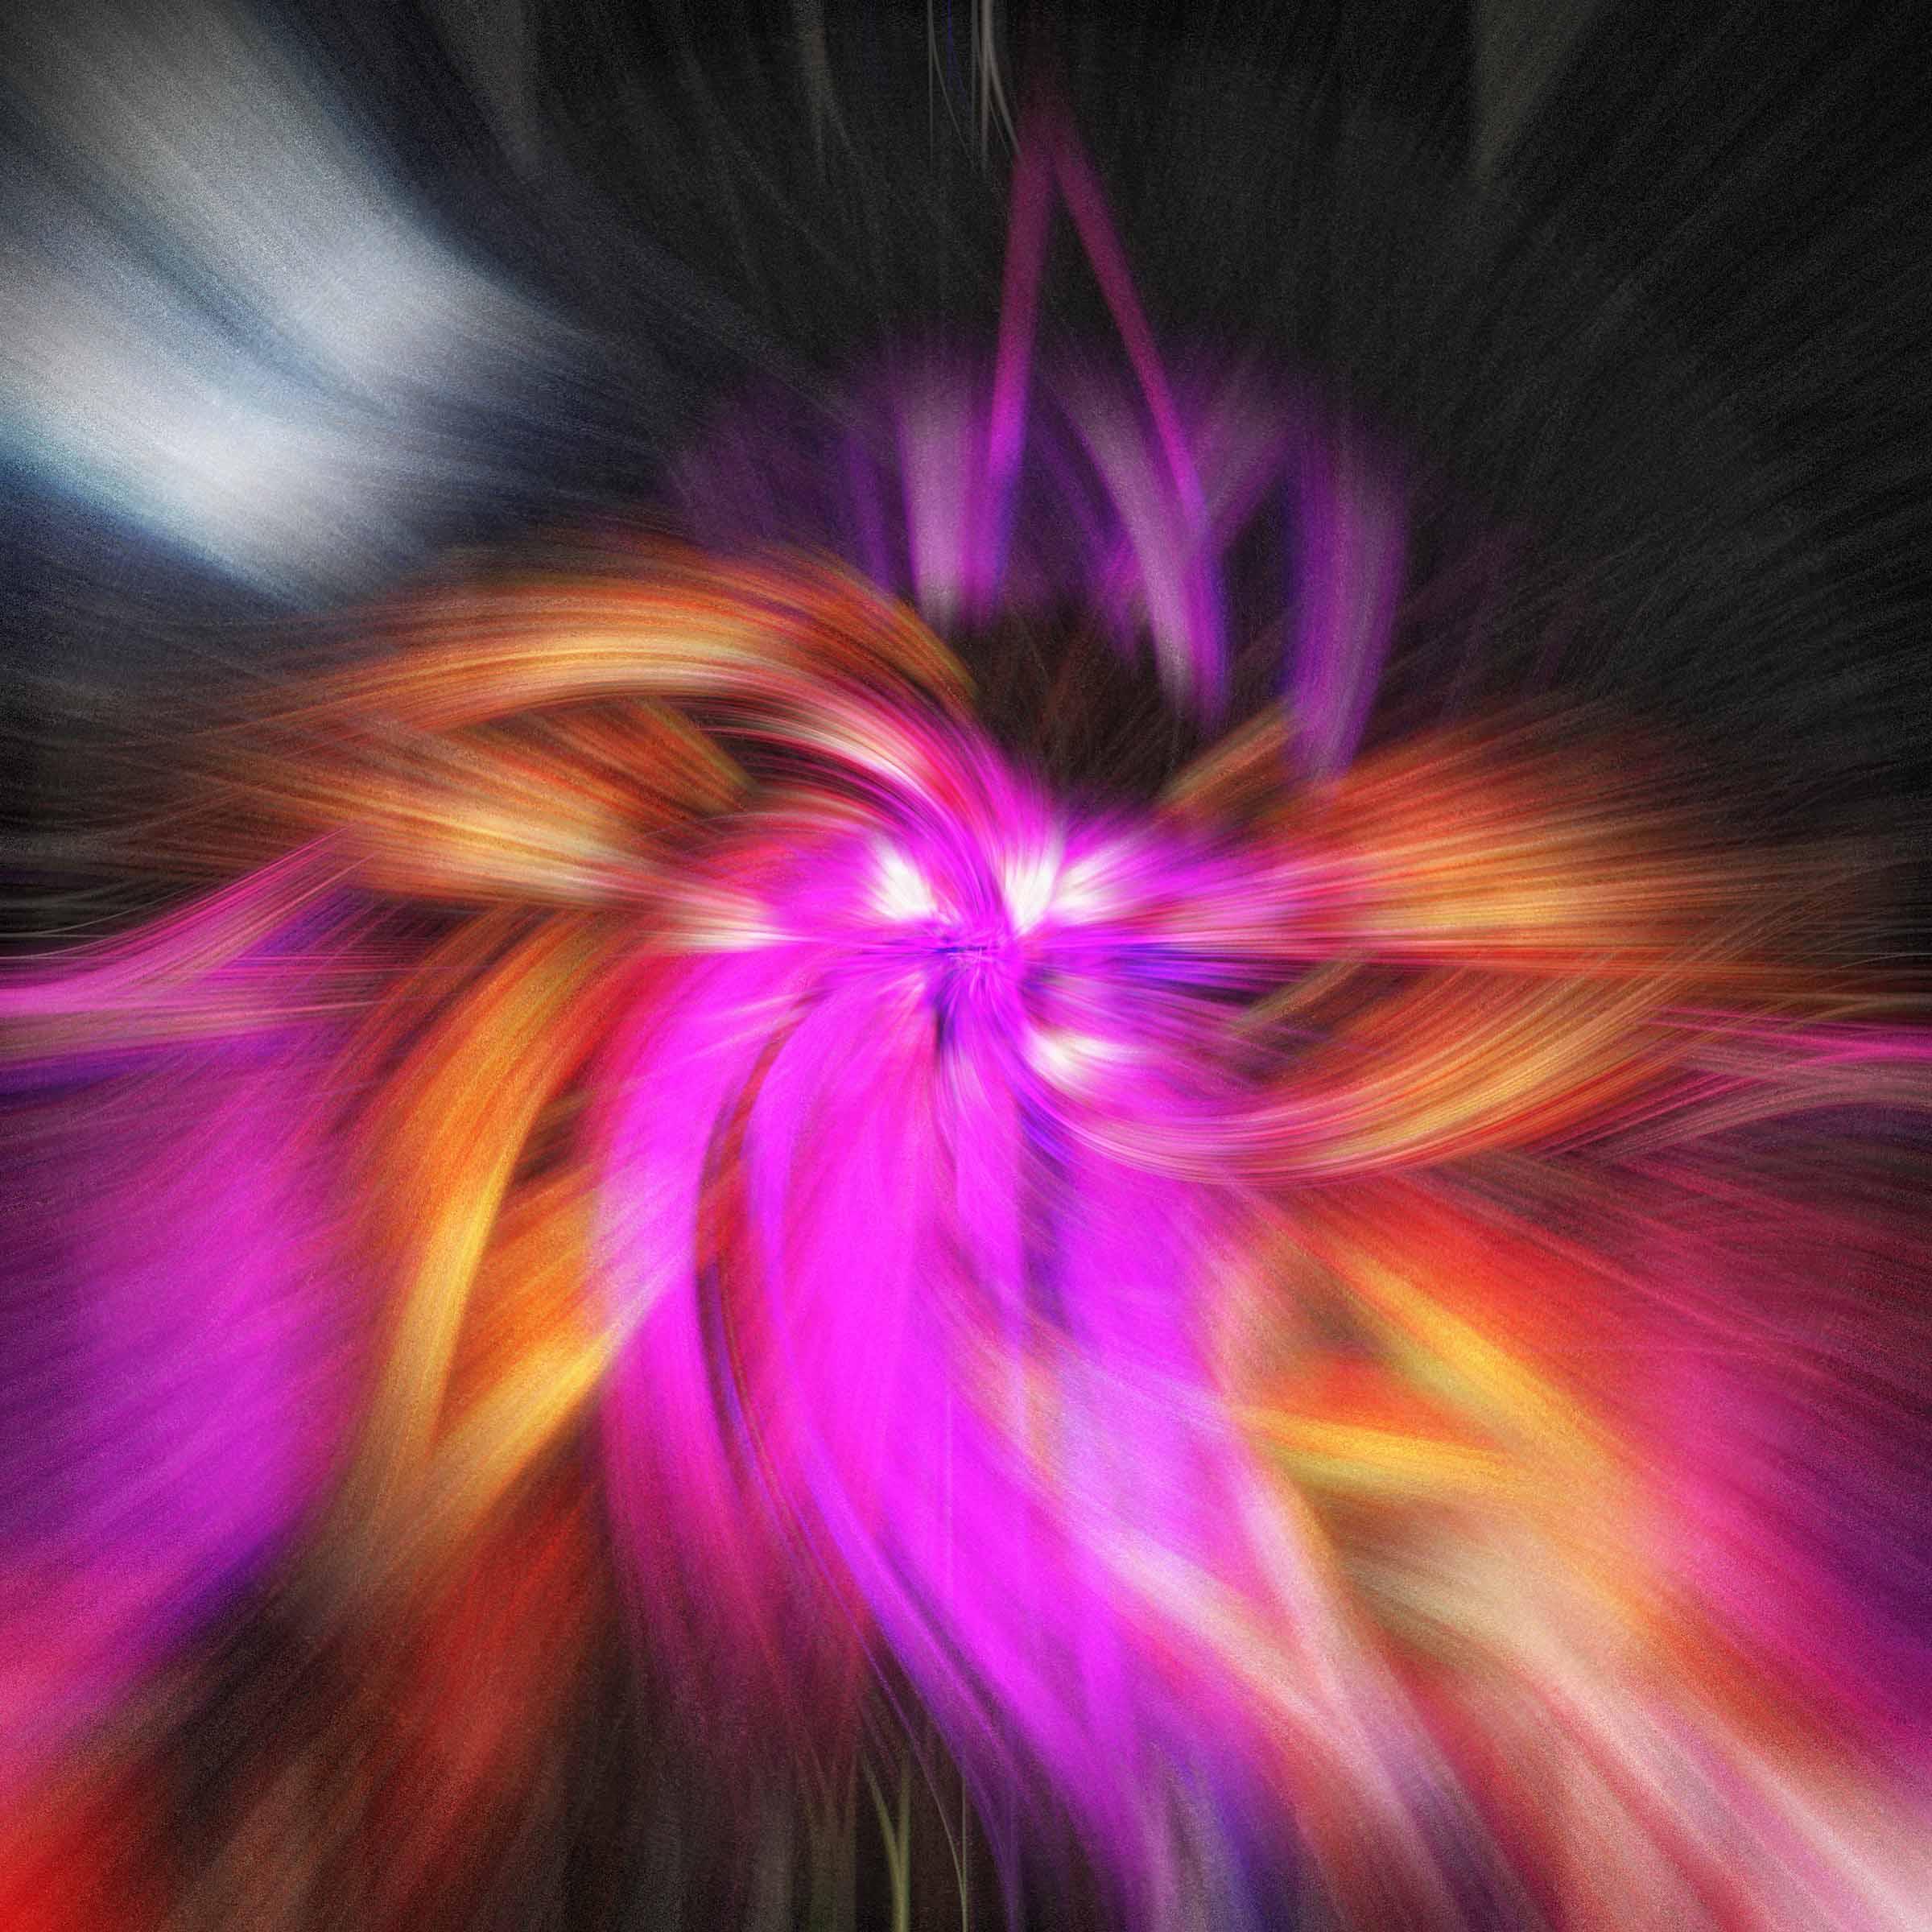 Purple and orange twirl effect image